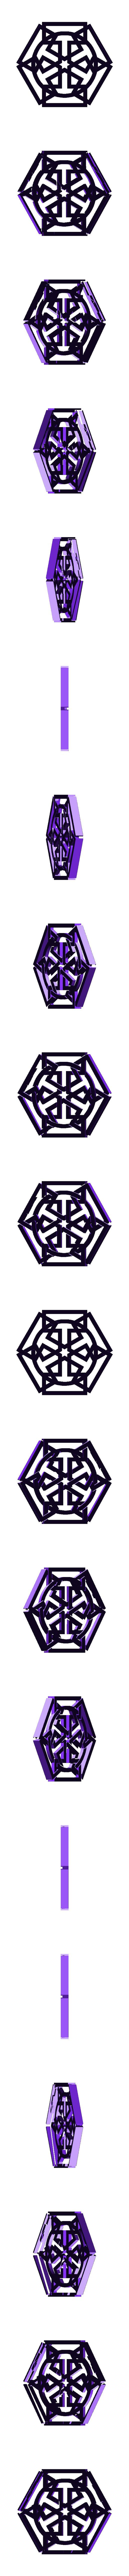 pattern.stl Download free STL file Secret geometry medallion • 3D printable model, Job